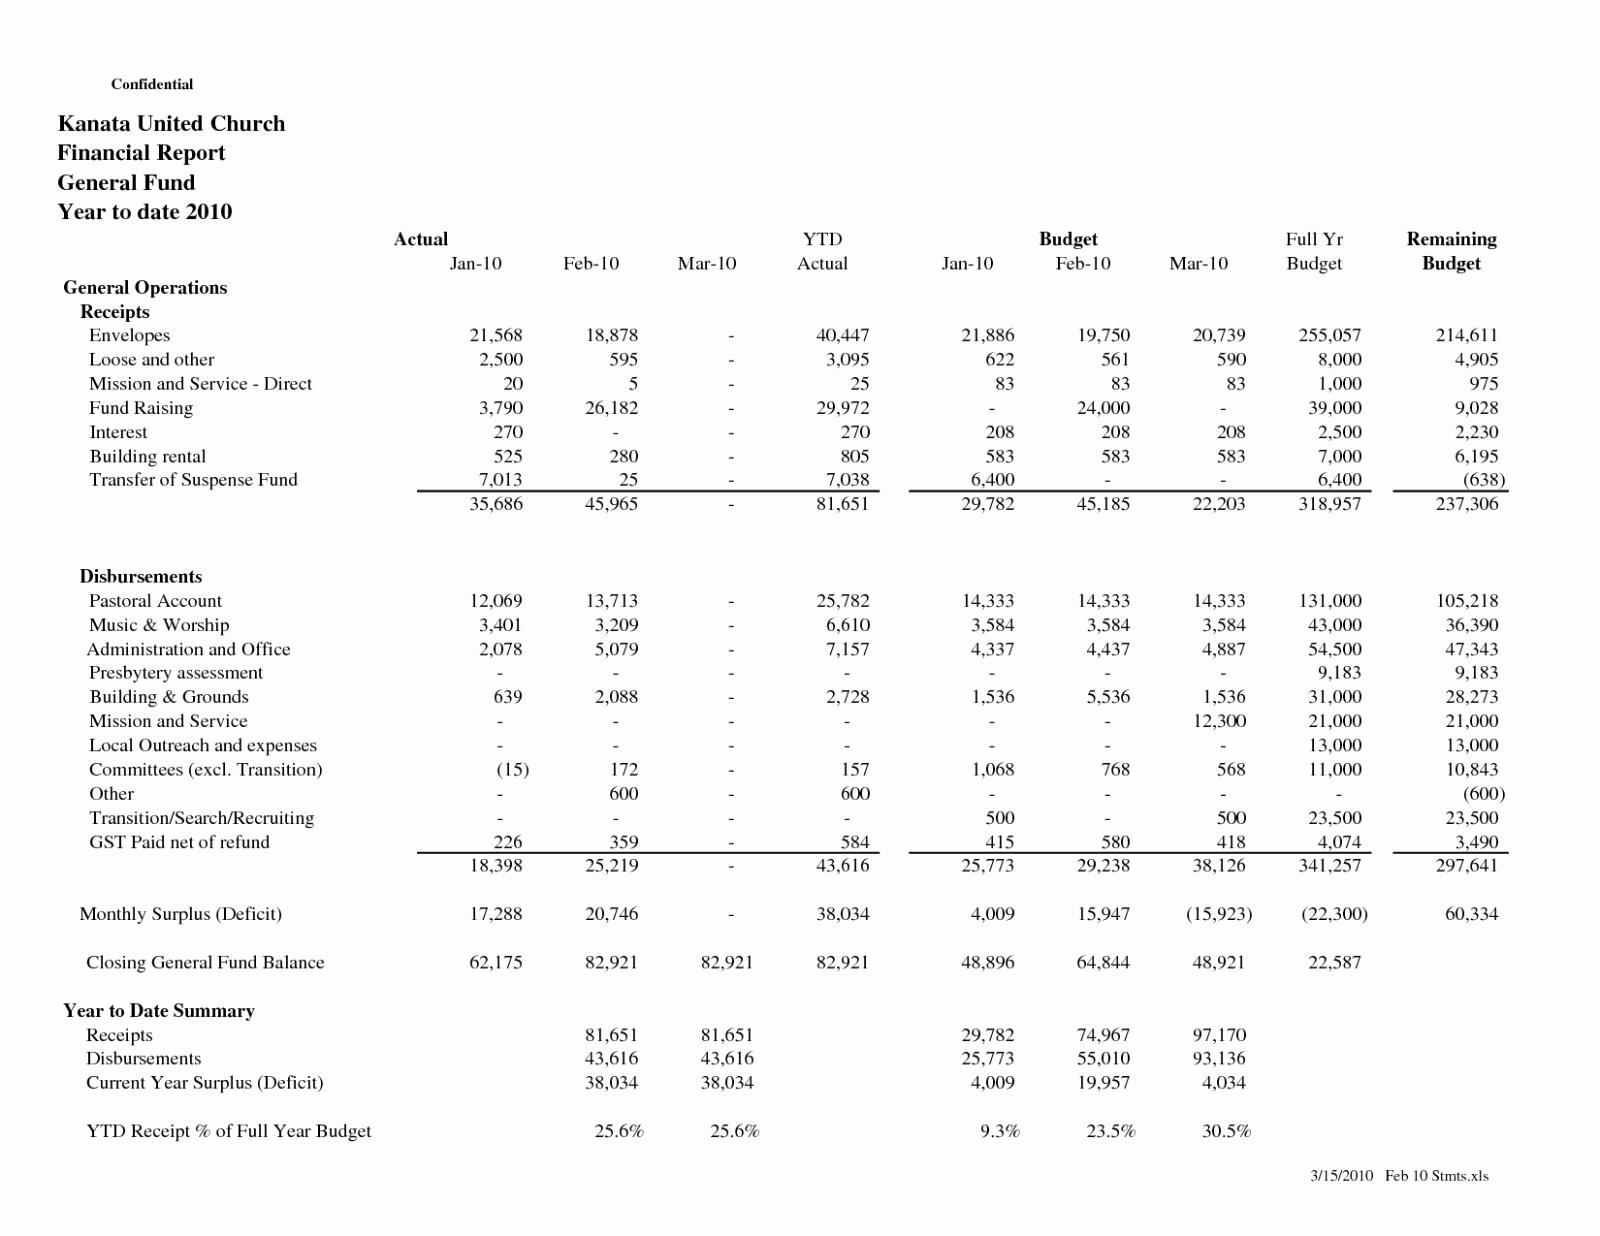 Treasurer Report Template Non Profit Unique Treasurers Report Template Pta Monthly Non Profit Excel